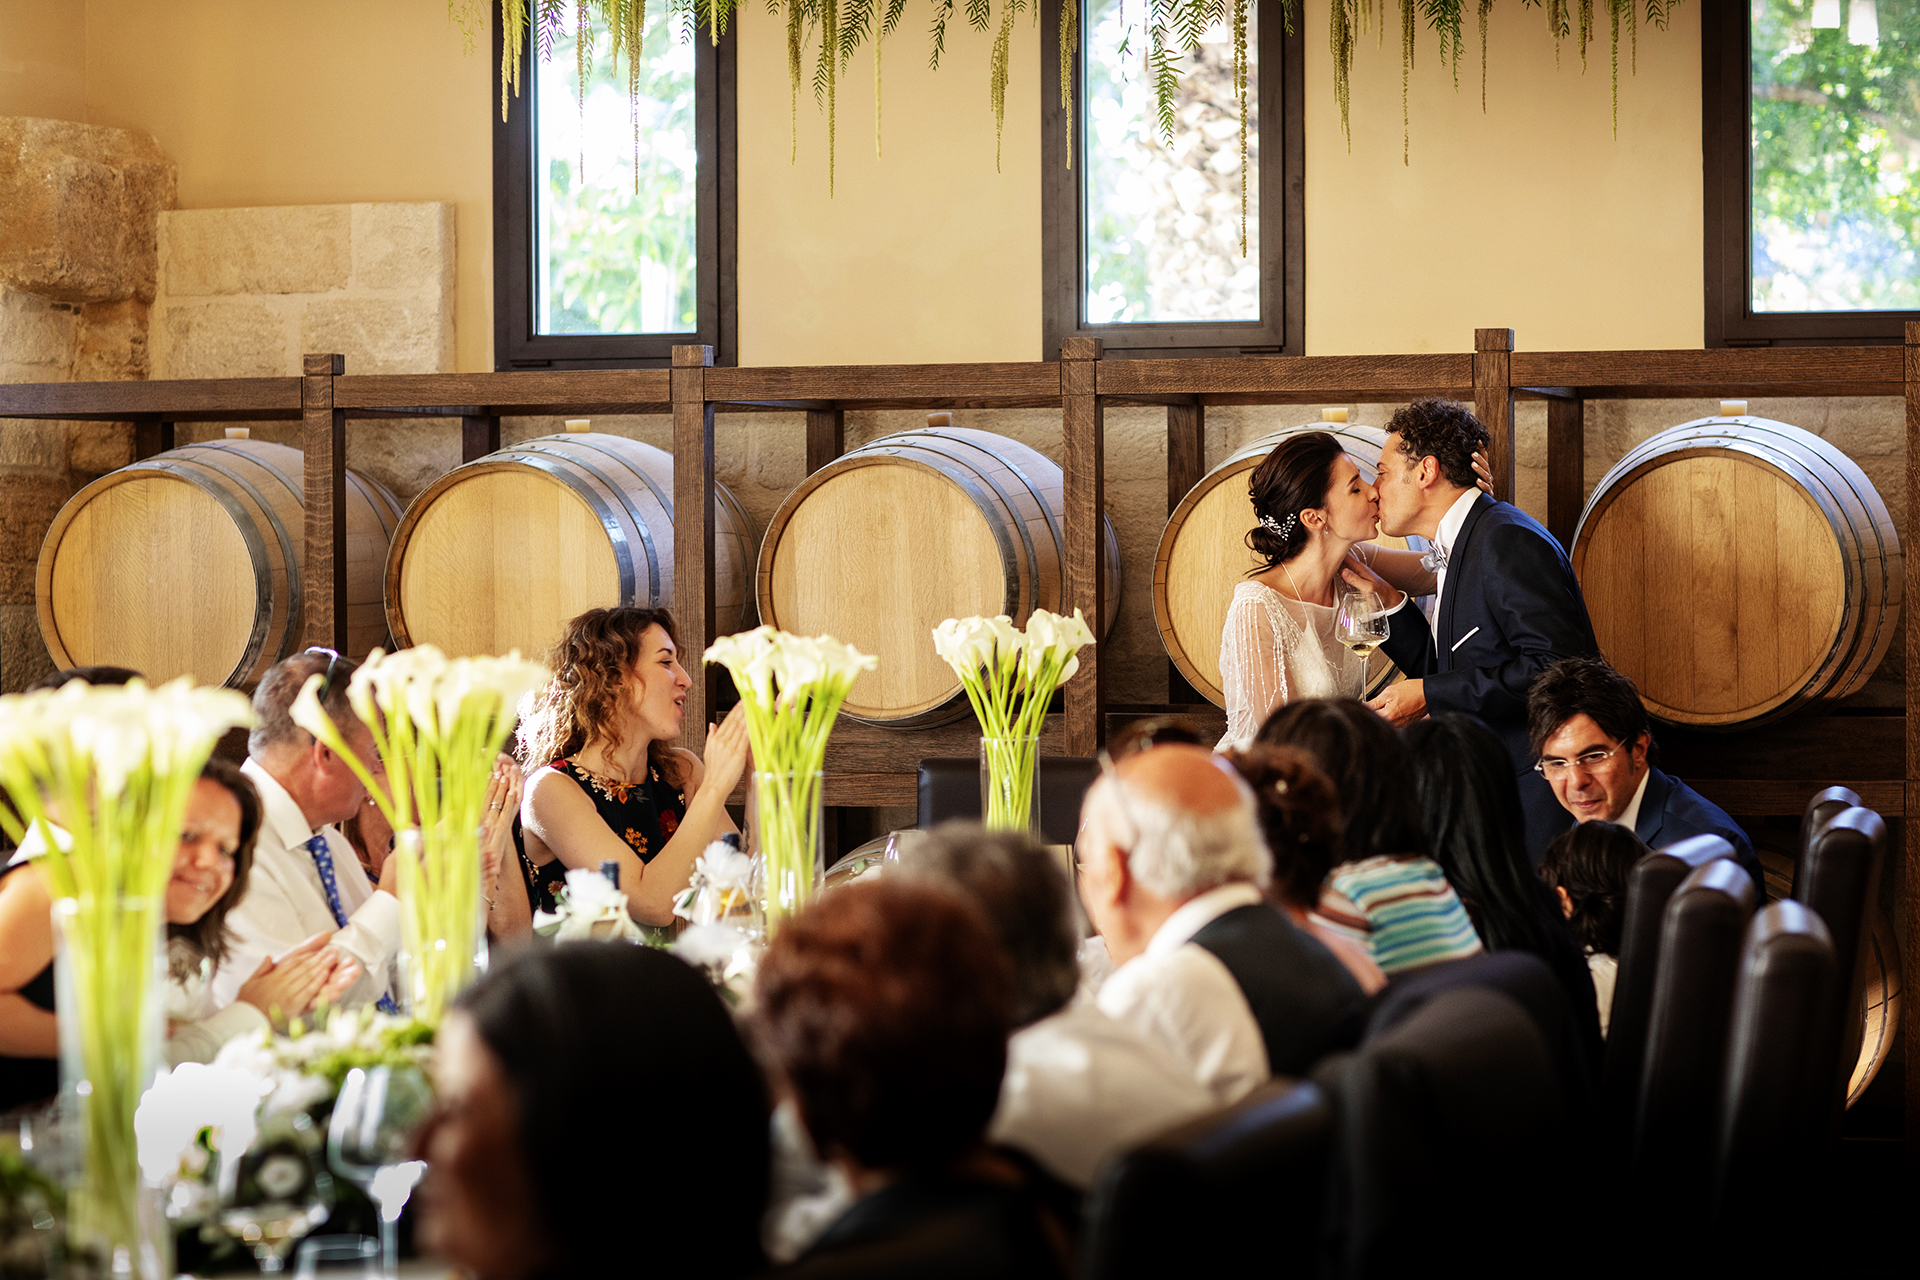 Trapani, Sicilië, Italië Elopement Reception Image | De receptie vond plaats in de Baglio Sorìa, waar iedereen aan één tafel zat